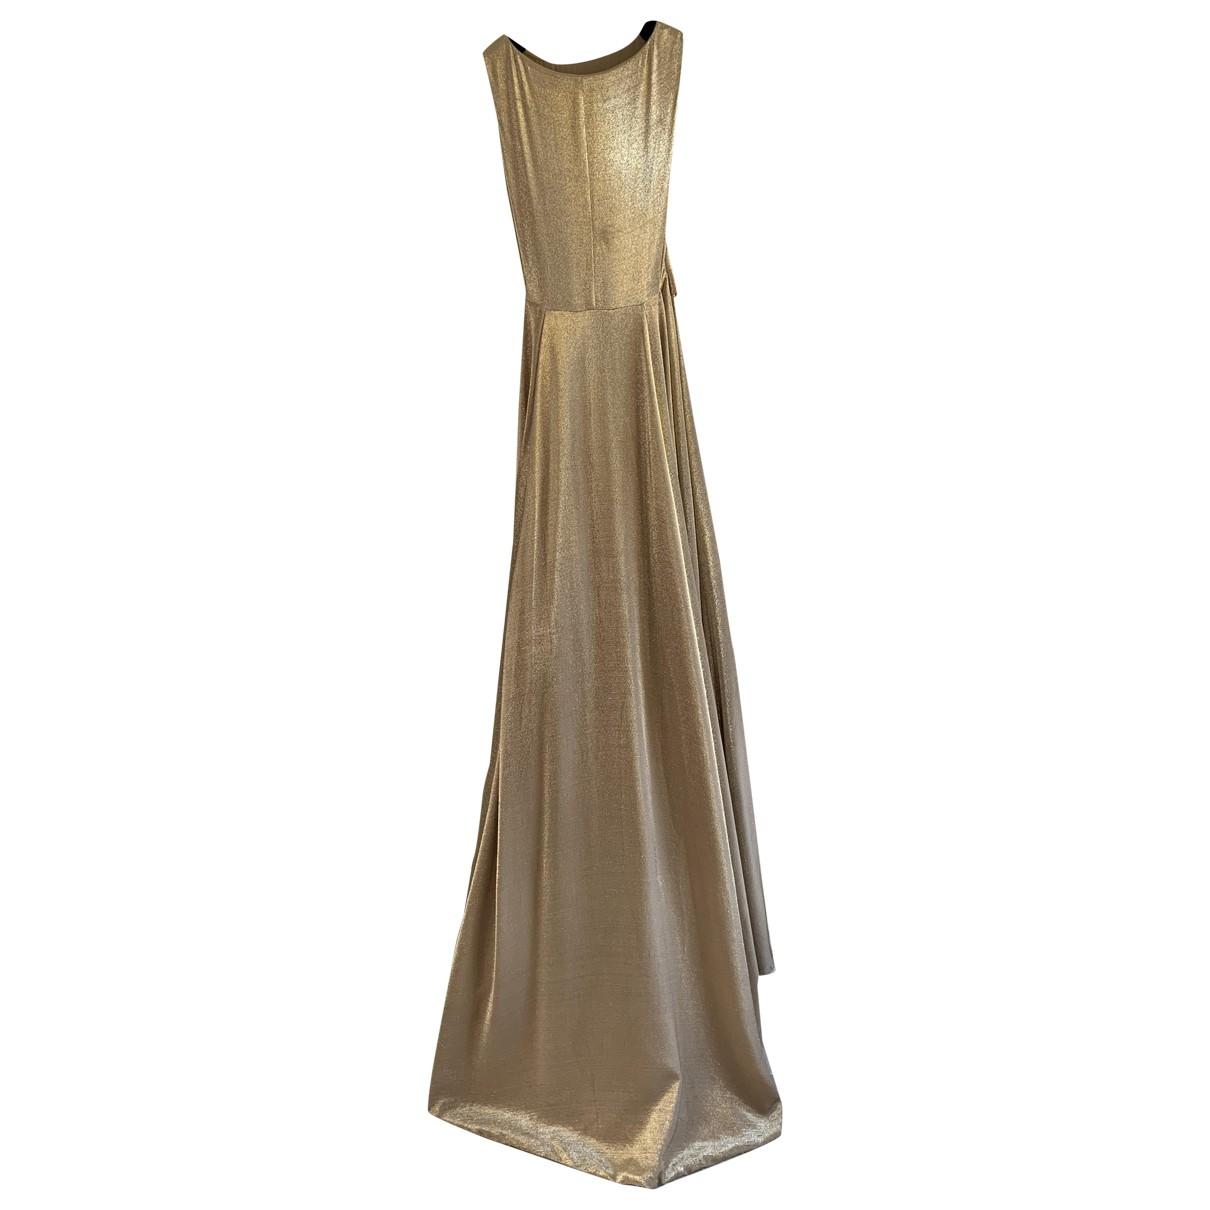 Ports 1961 \N Gold Silk dress for Women 38 IT